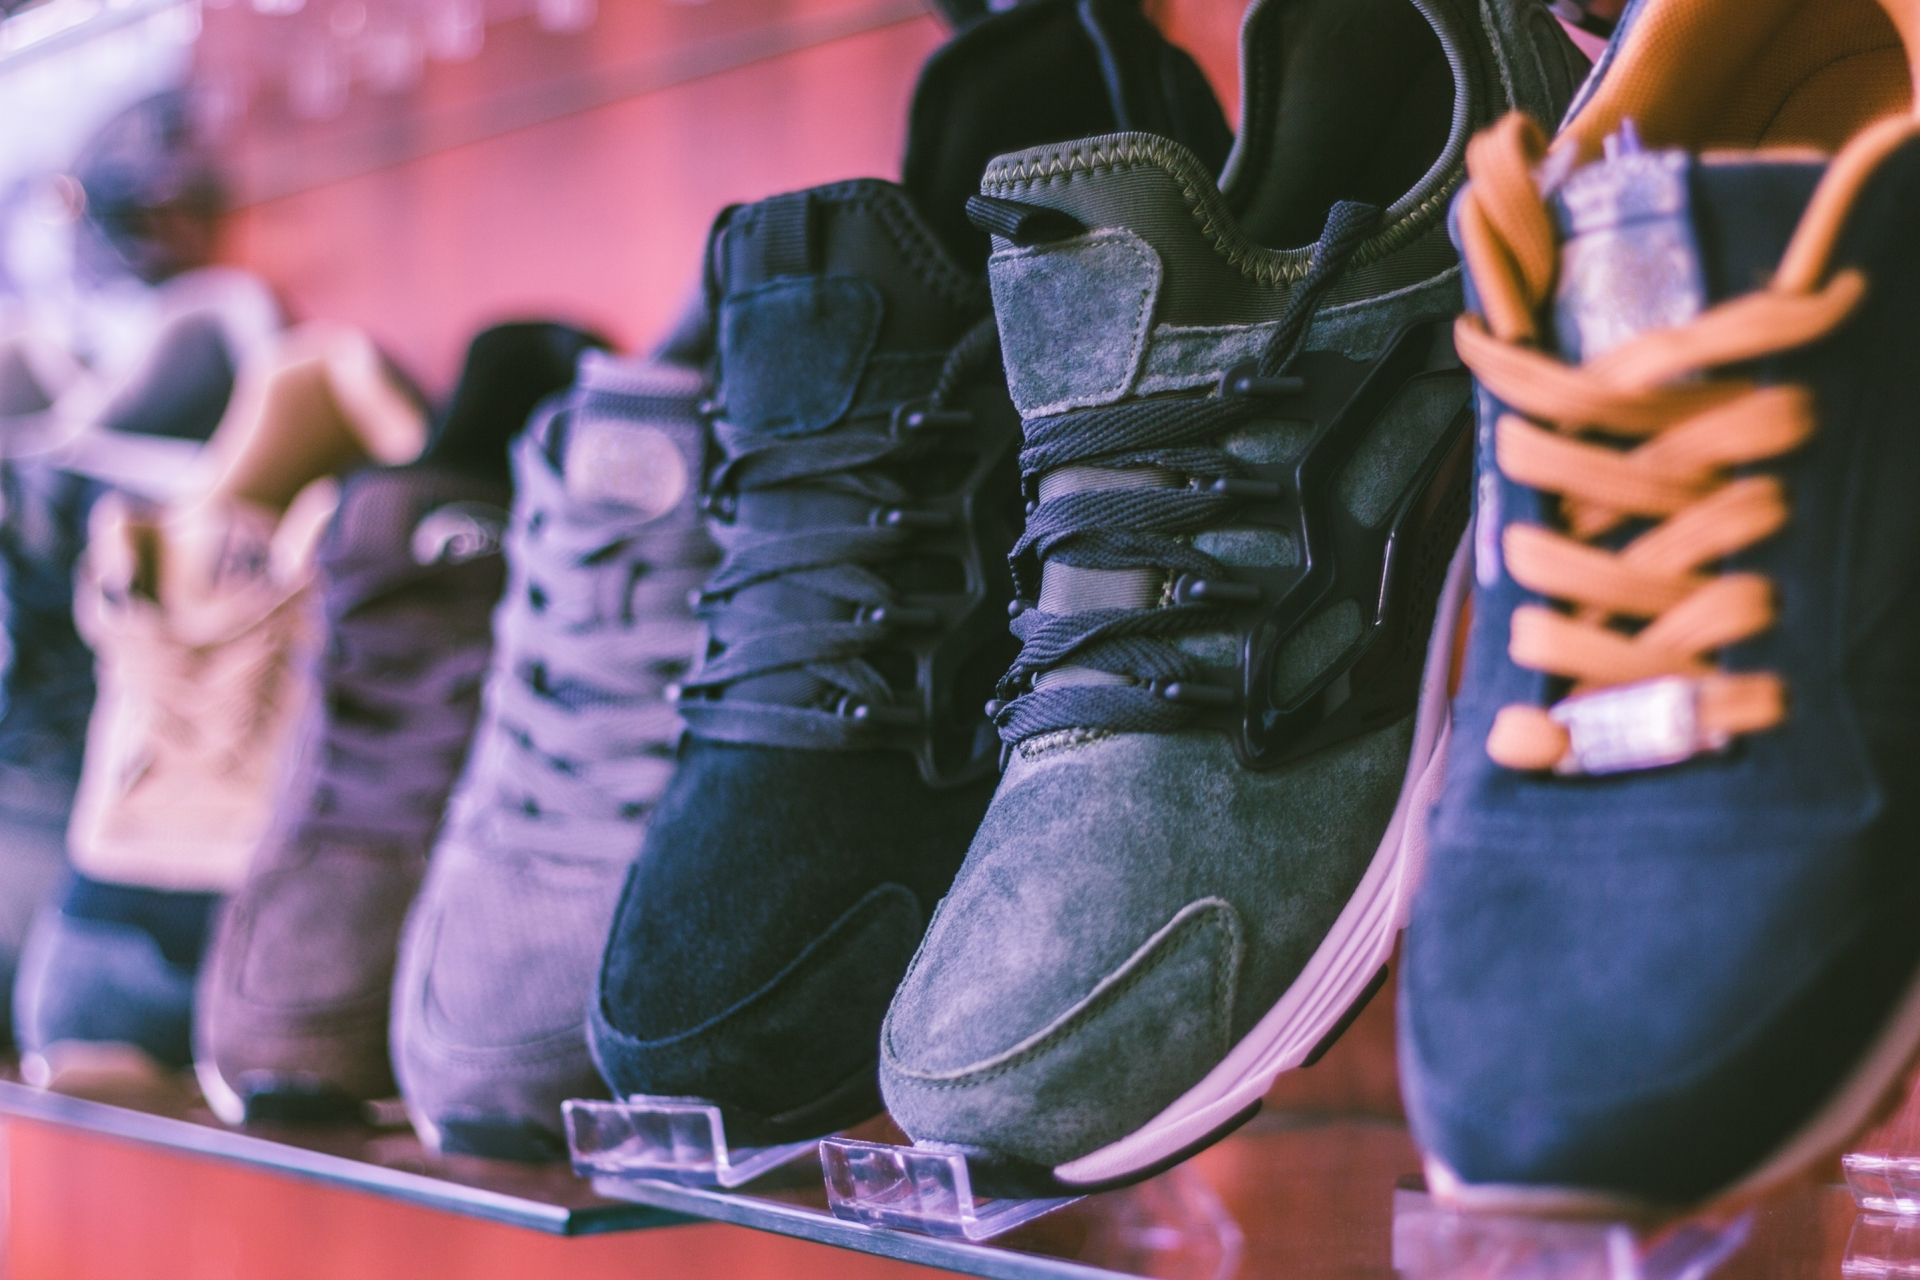 Air Jordan, Yeezy, New Balance: The